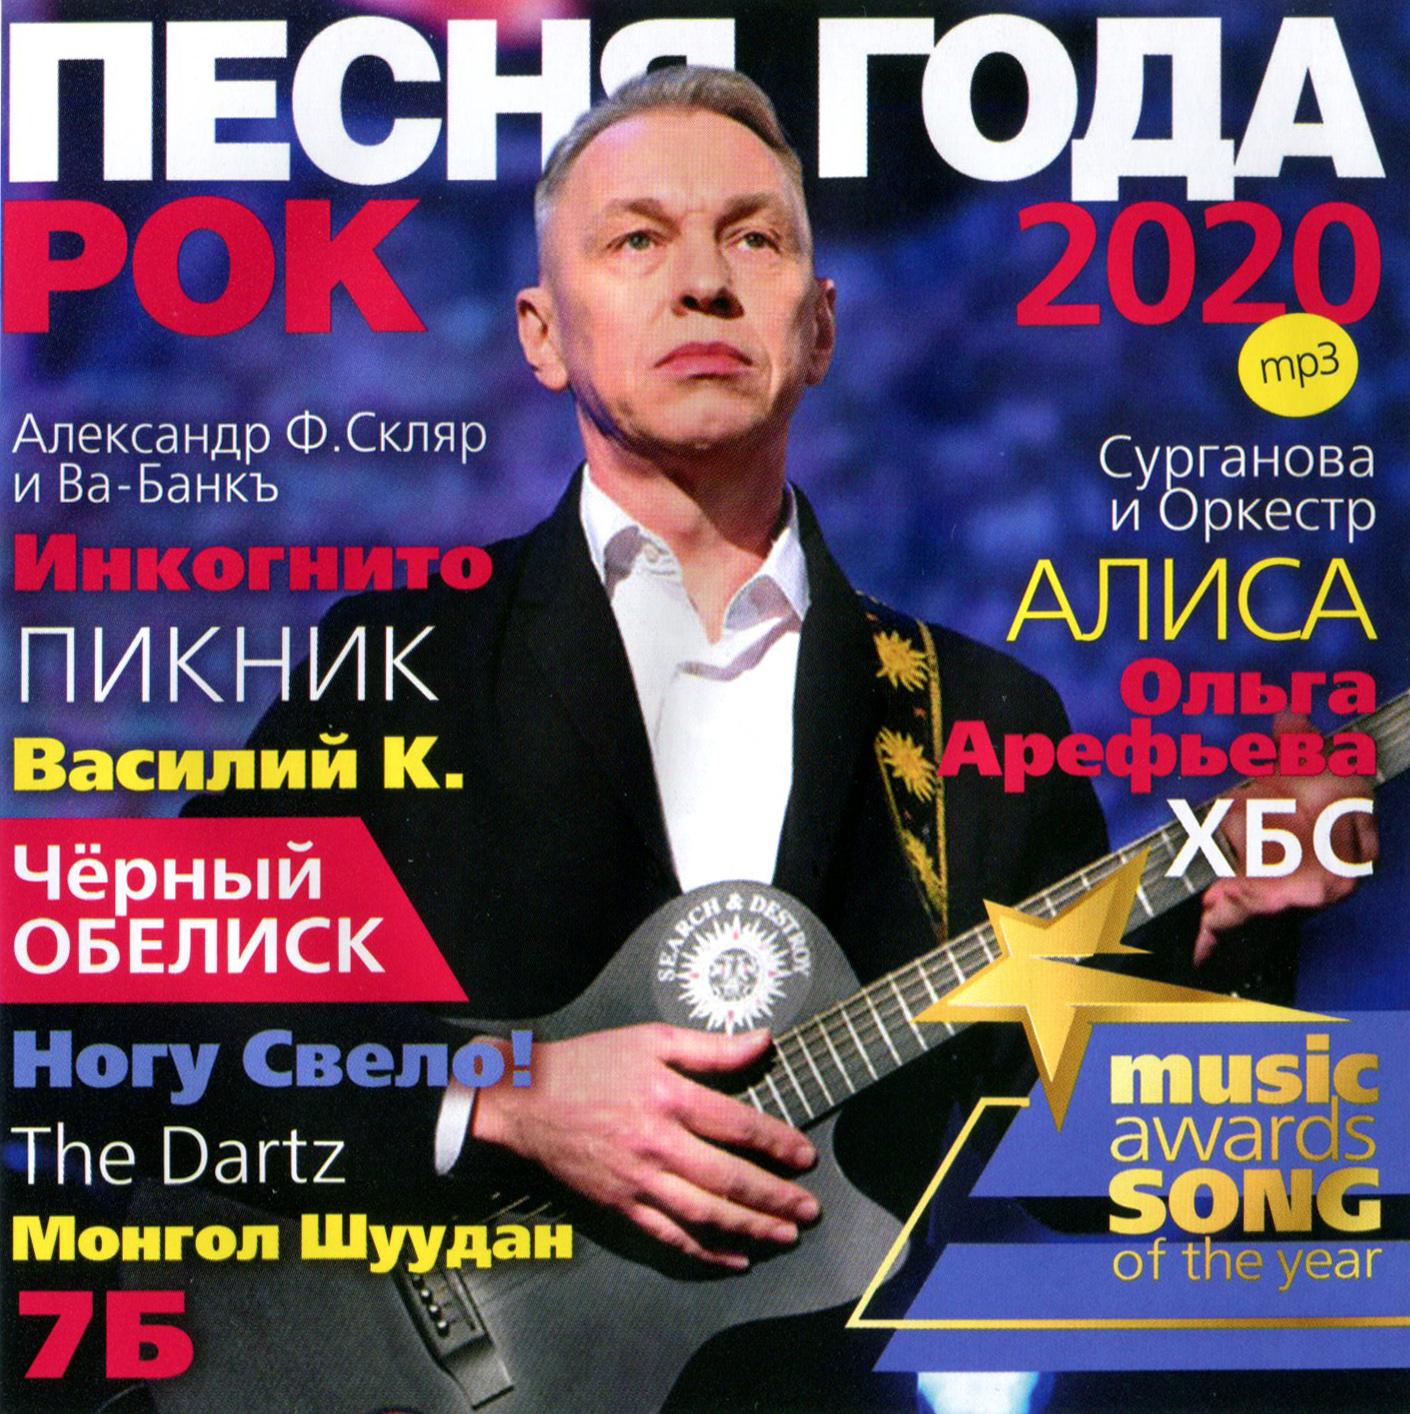 ПЕСНЯ ГОДА - 2020 рок [mp3]